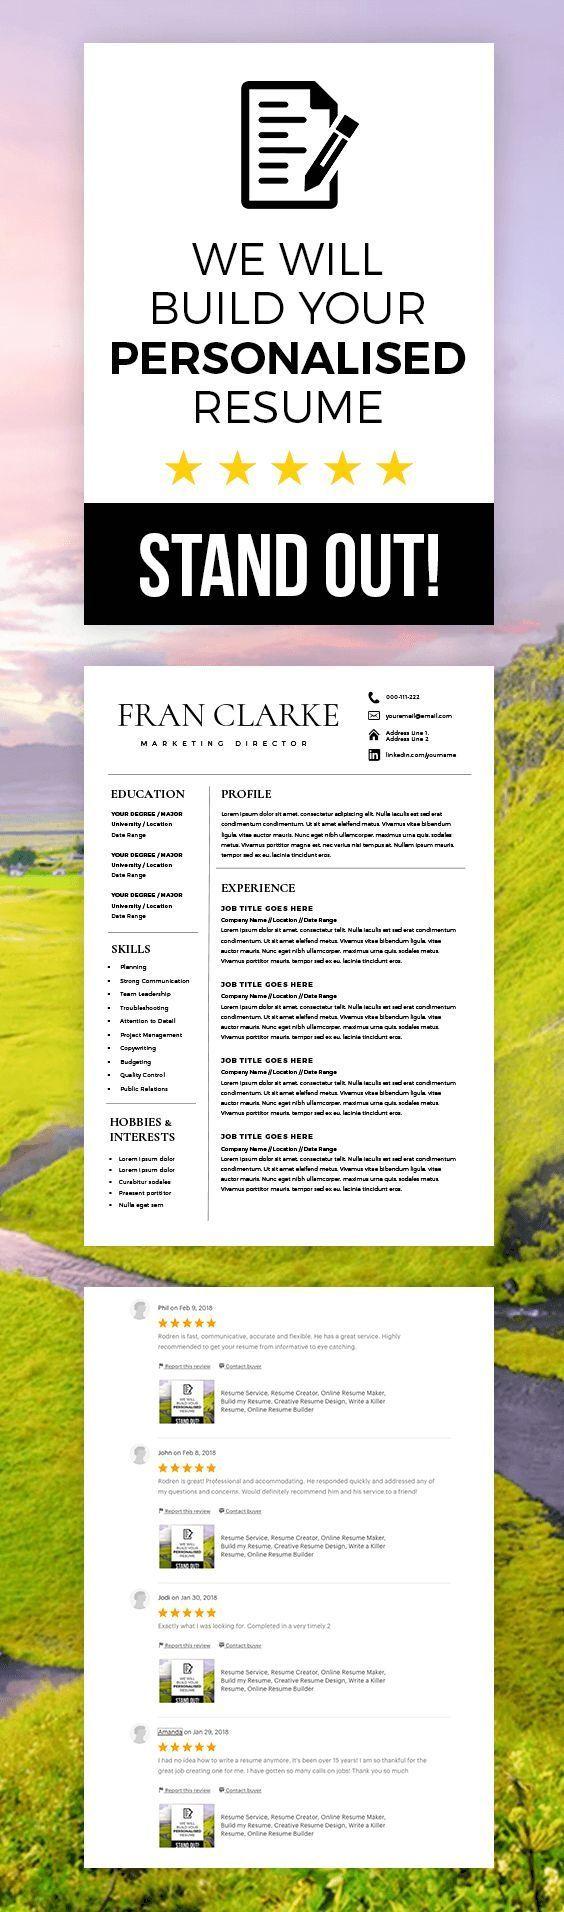 Online resume services